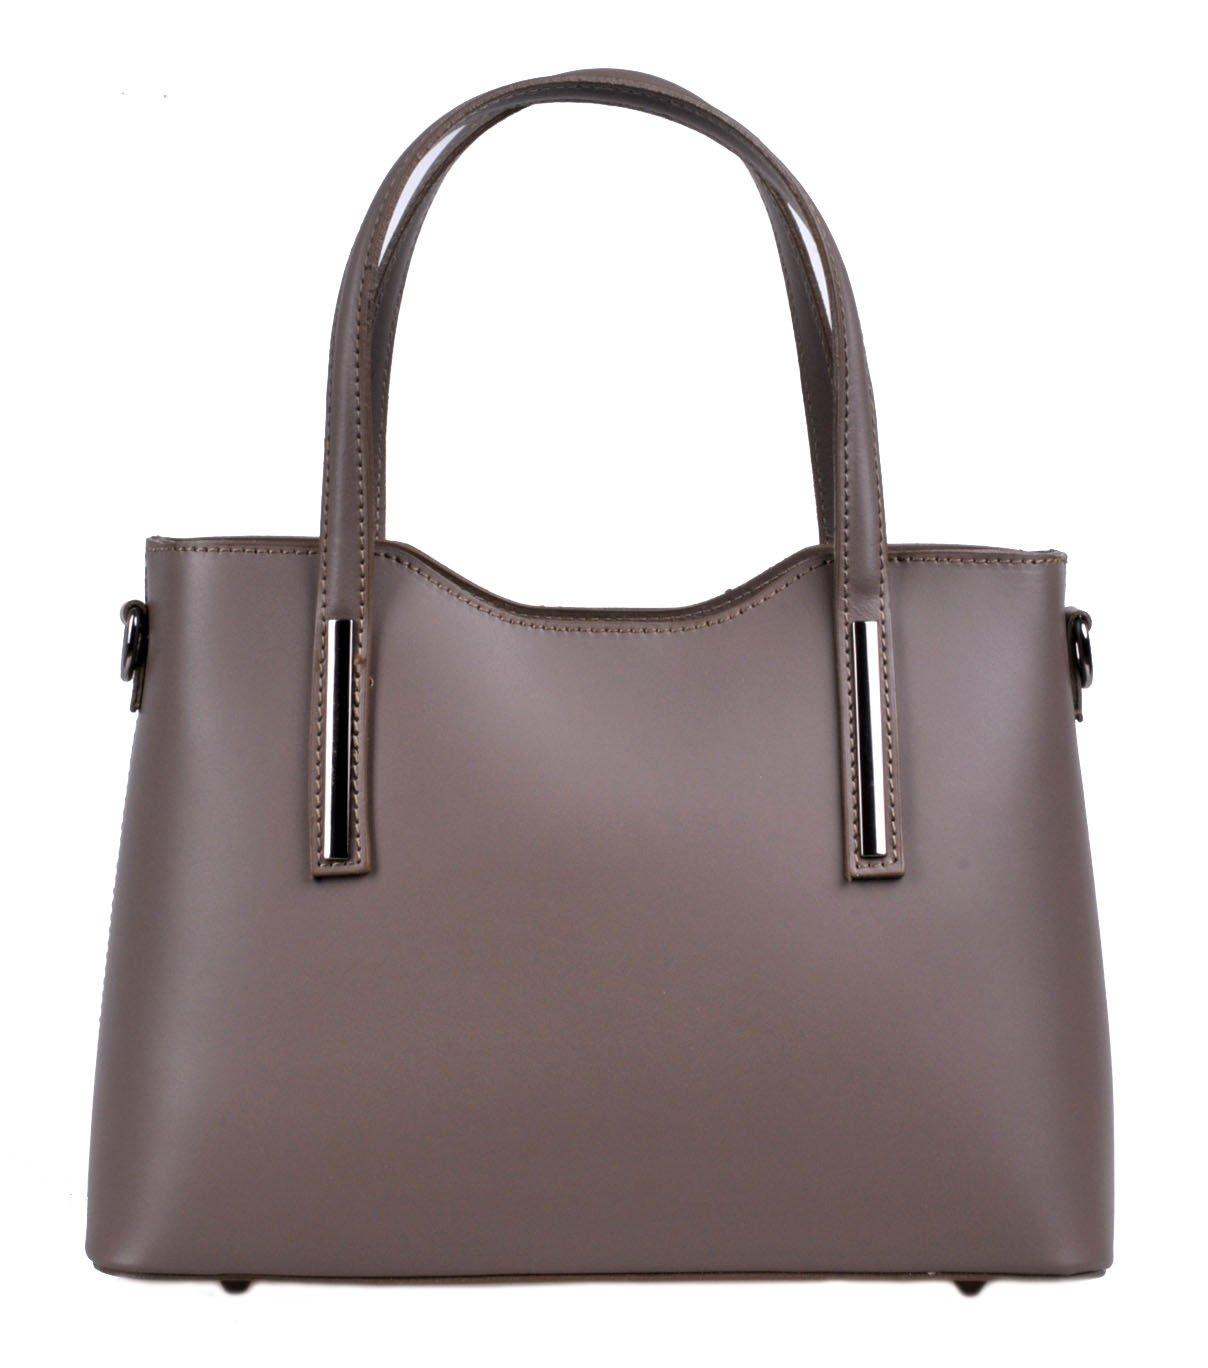 Dámská kožená kabelka 5136 TAUPE p. ee406b31ee2